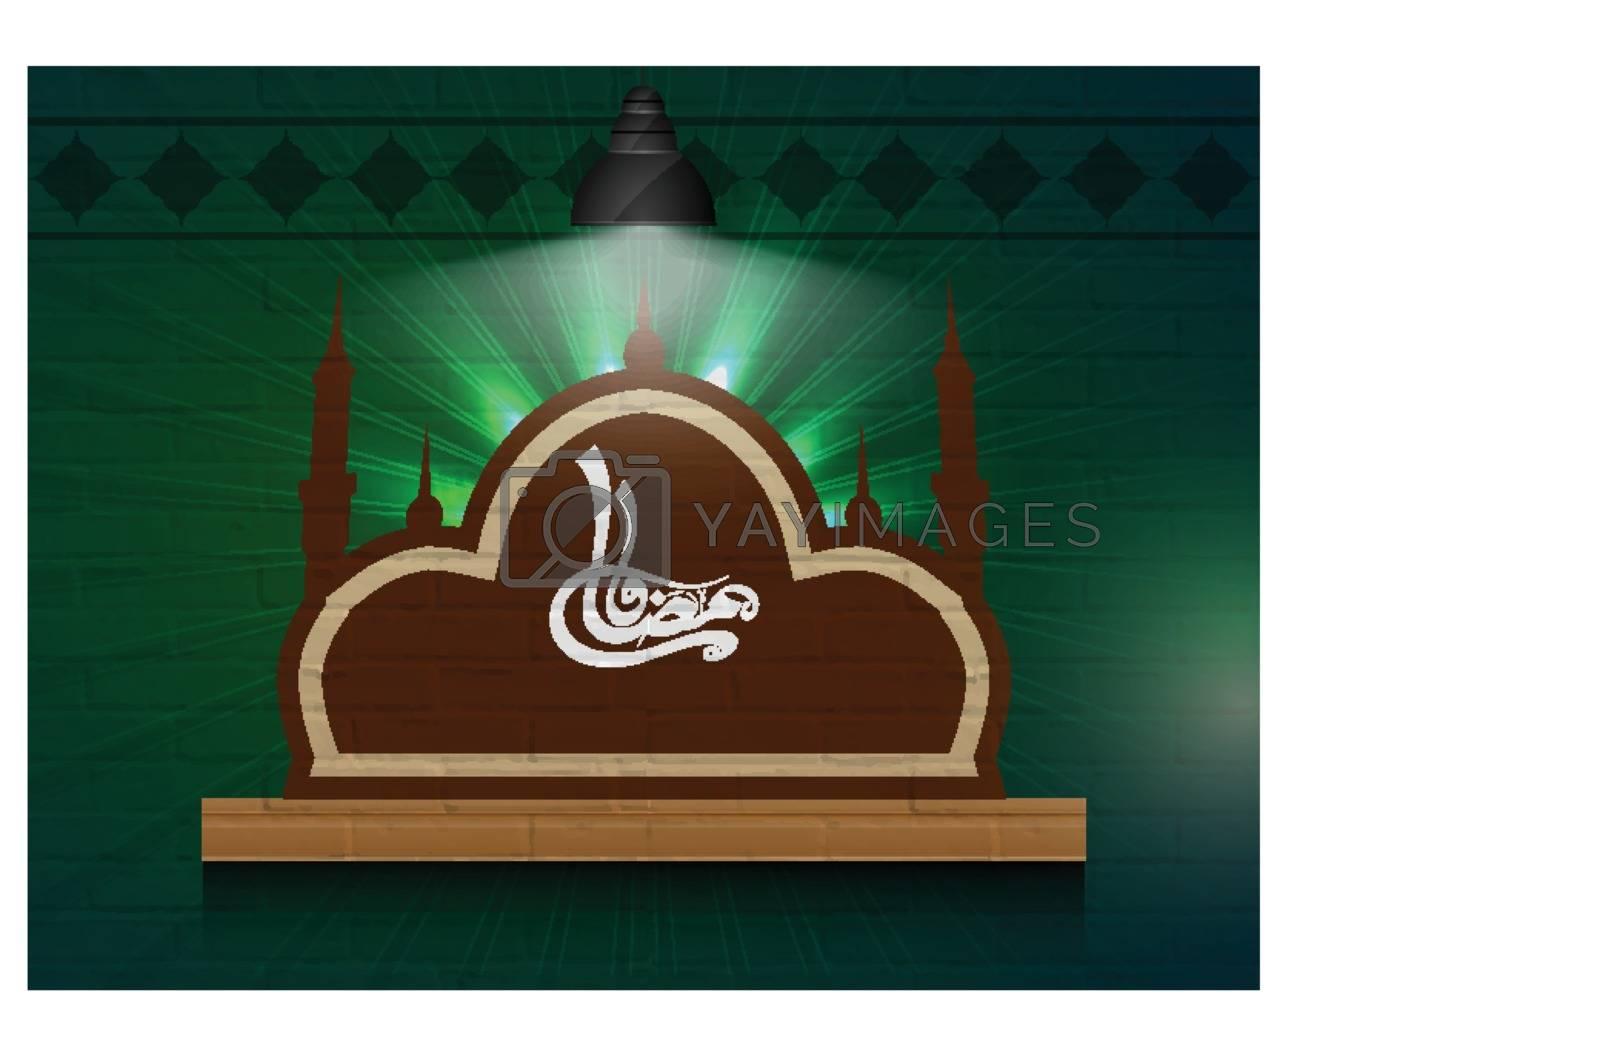 Arabic calligraphy text Ramadan Kareem on creative mosque, shinging in lights for islamic holy month of prayer celebration.